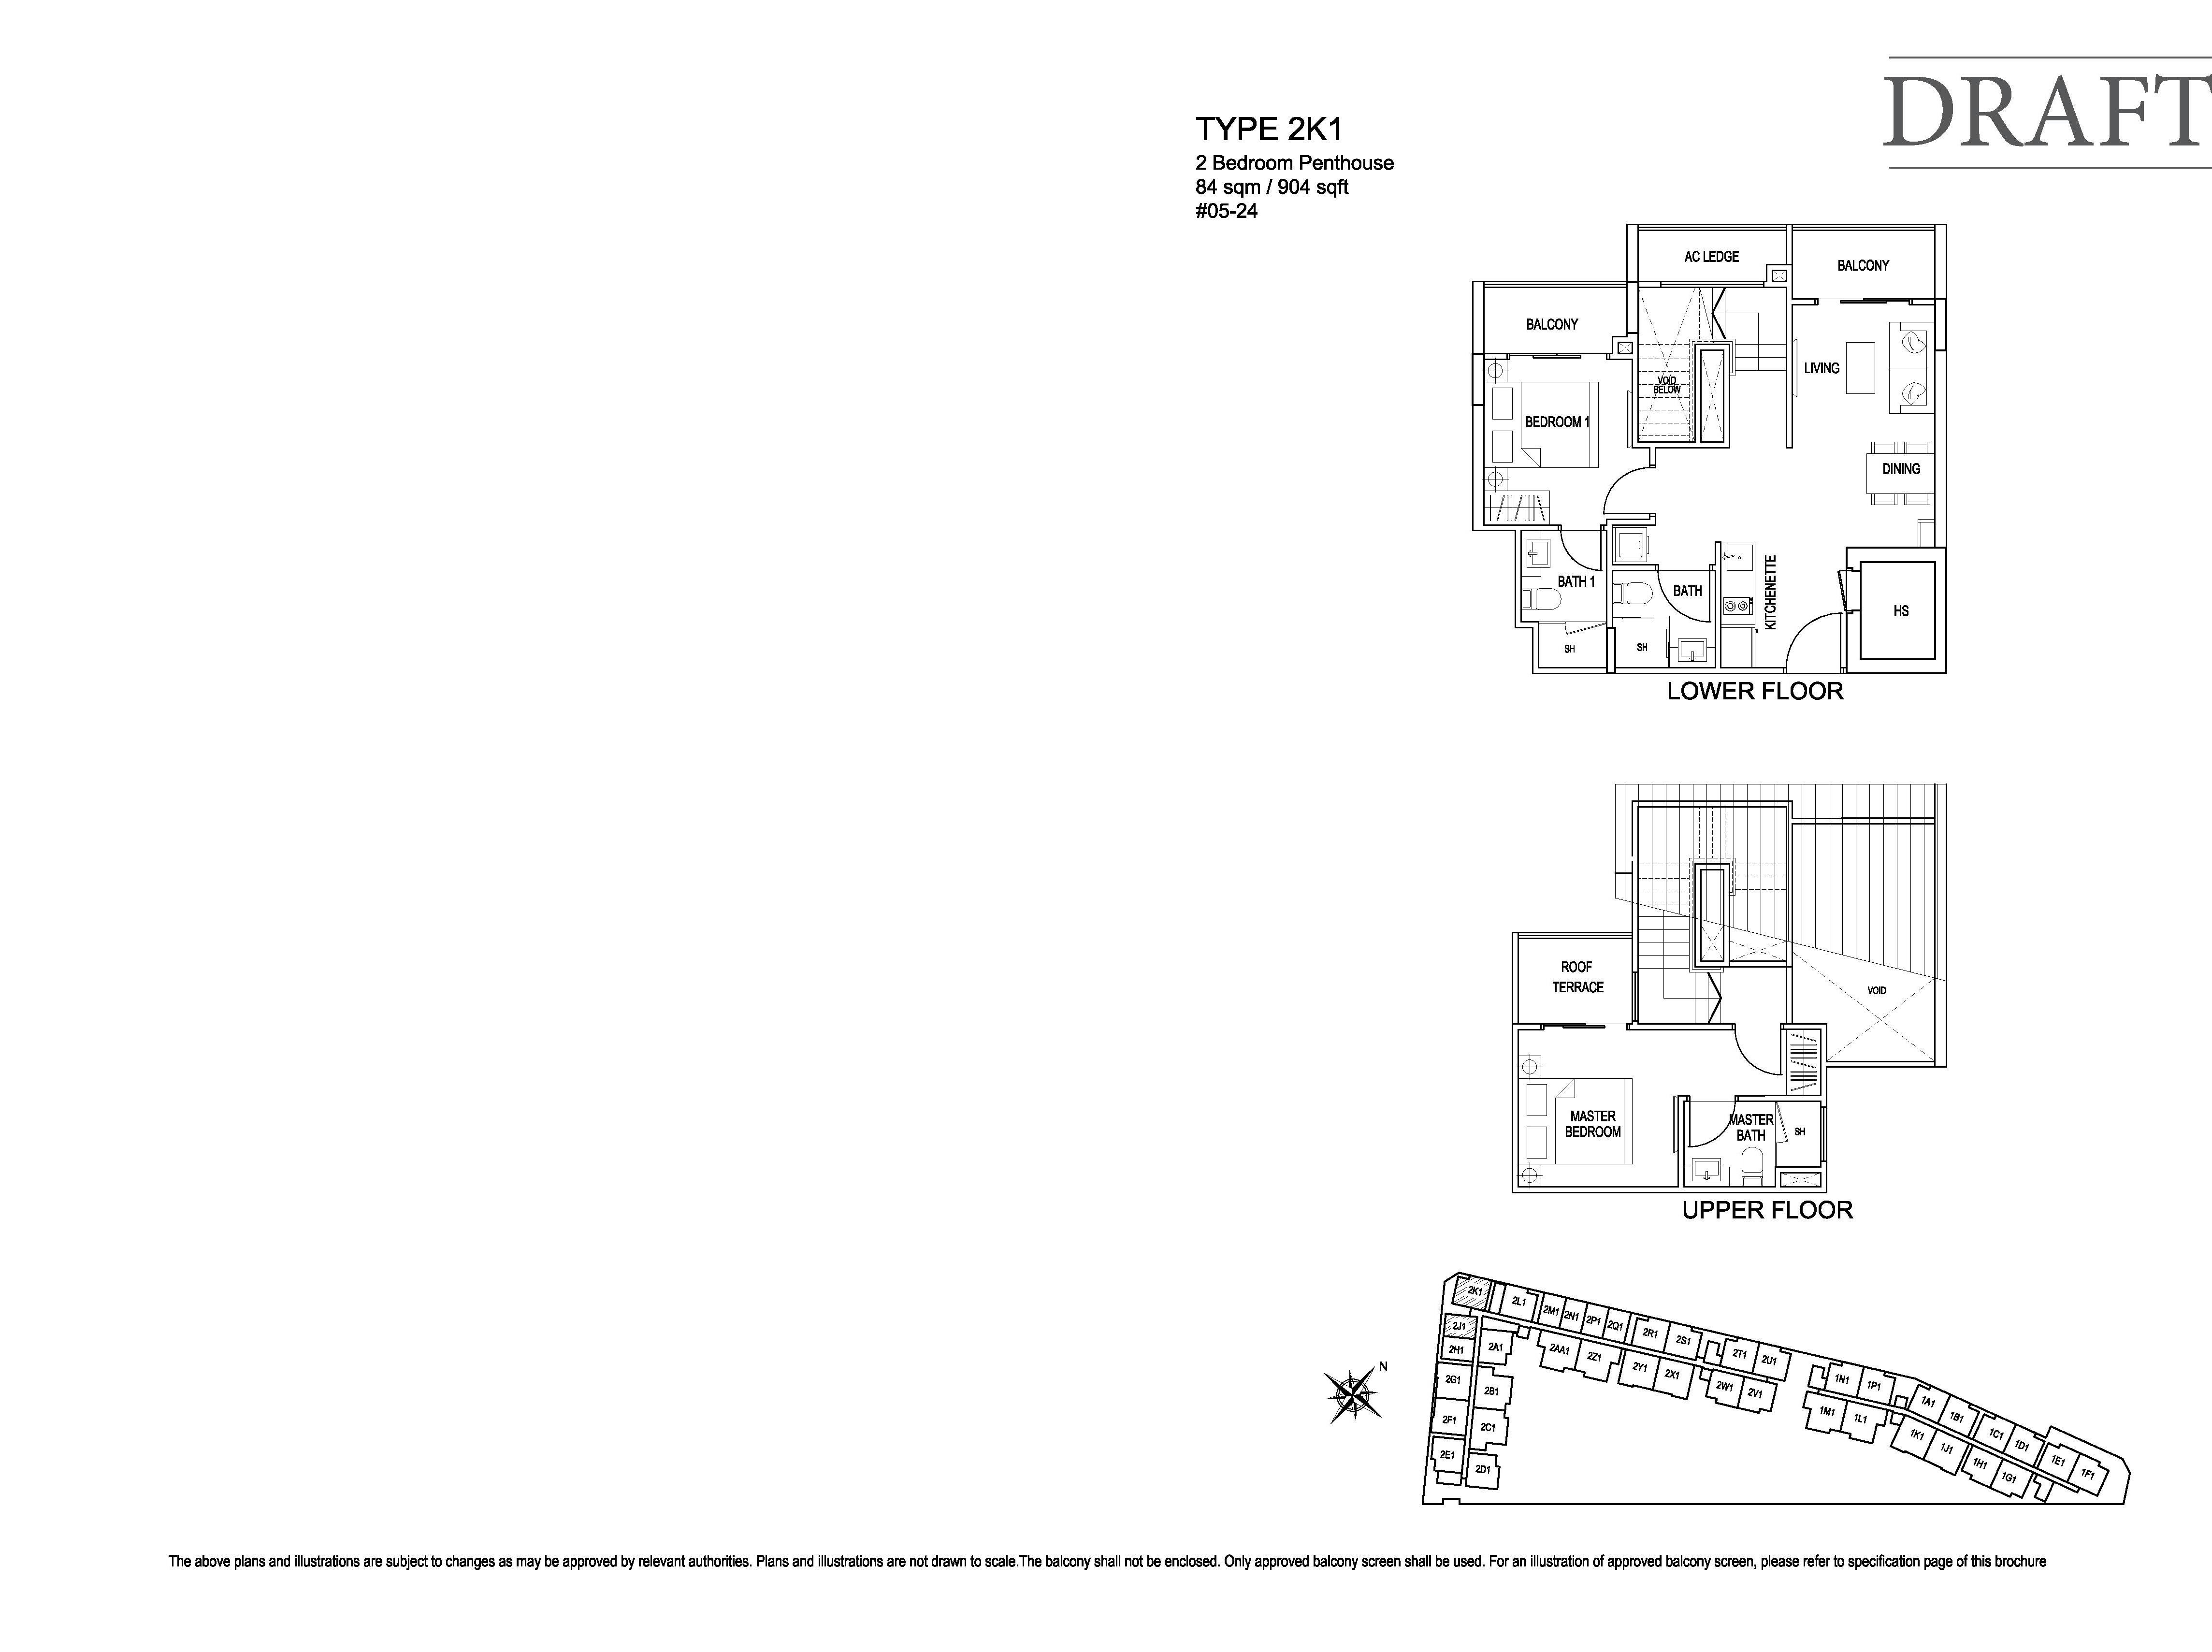 Kensington Square 2 Bedroom Penthouse Floor Plans Type 2K1